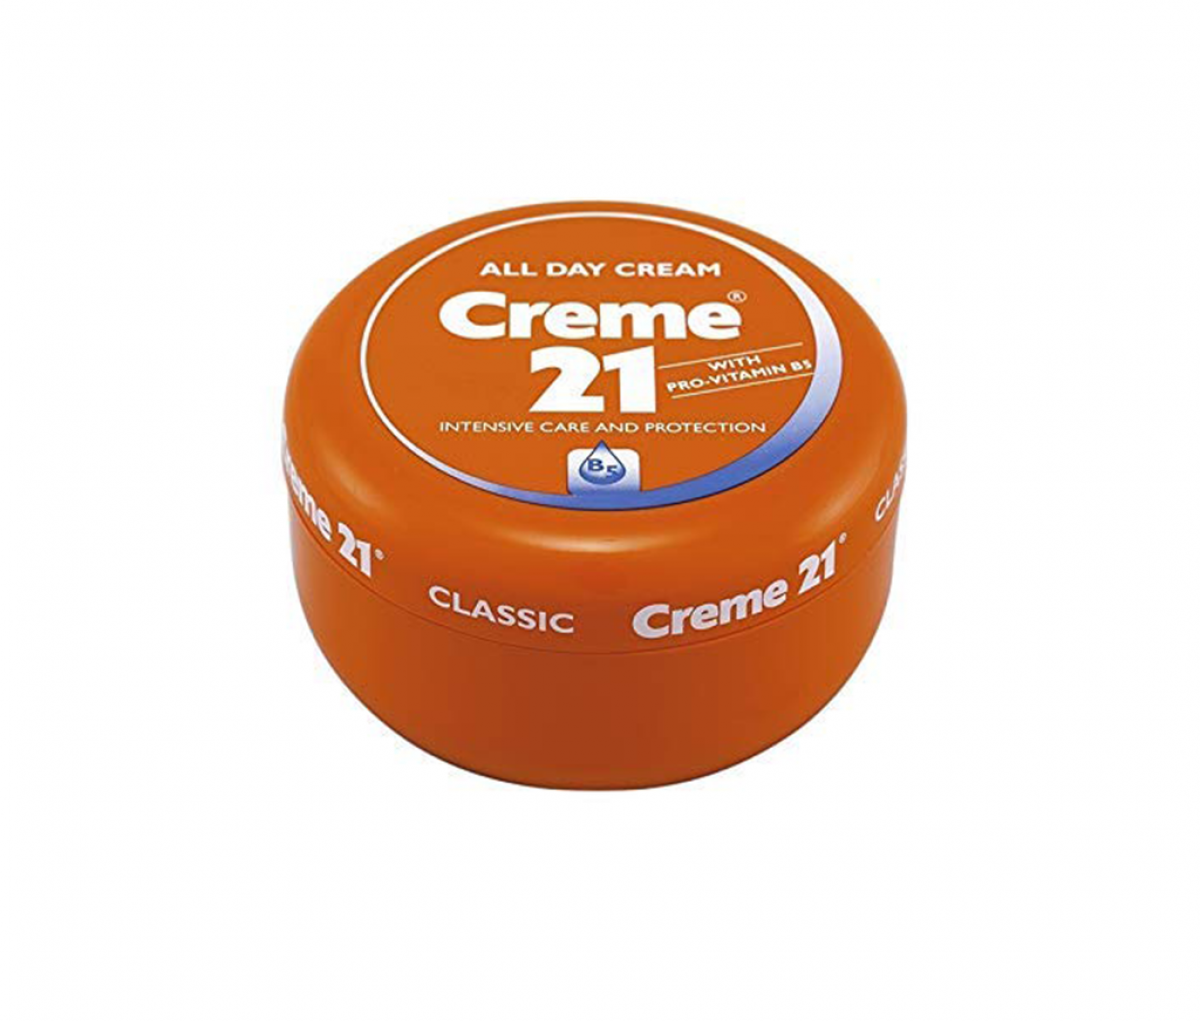 Creme21 all day cream 250ml